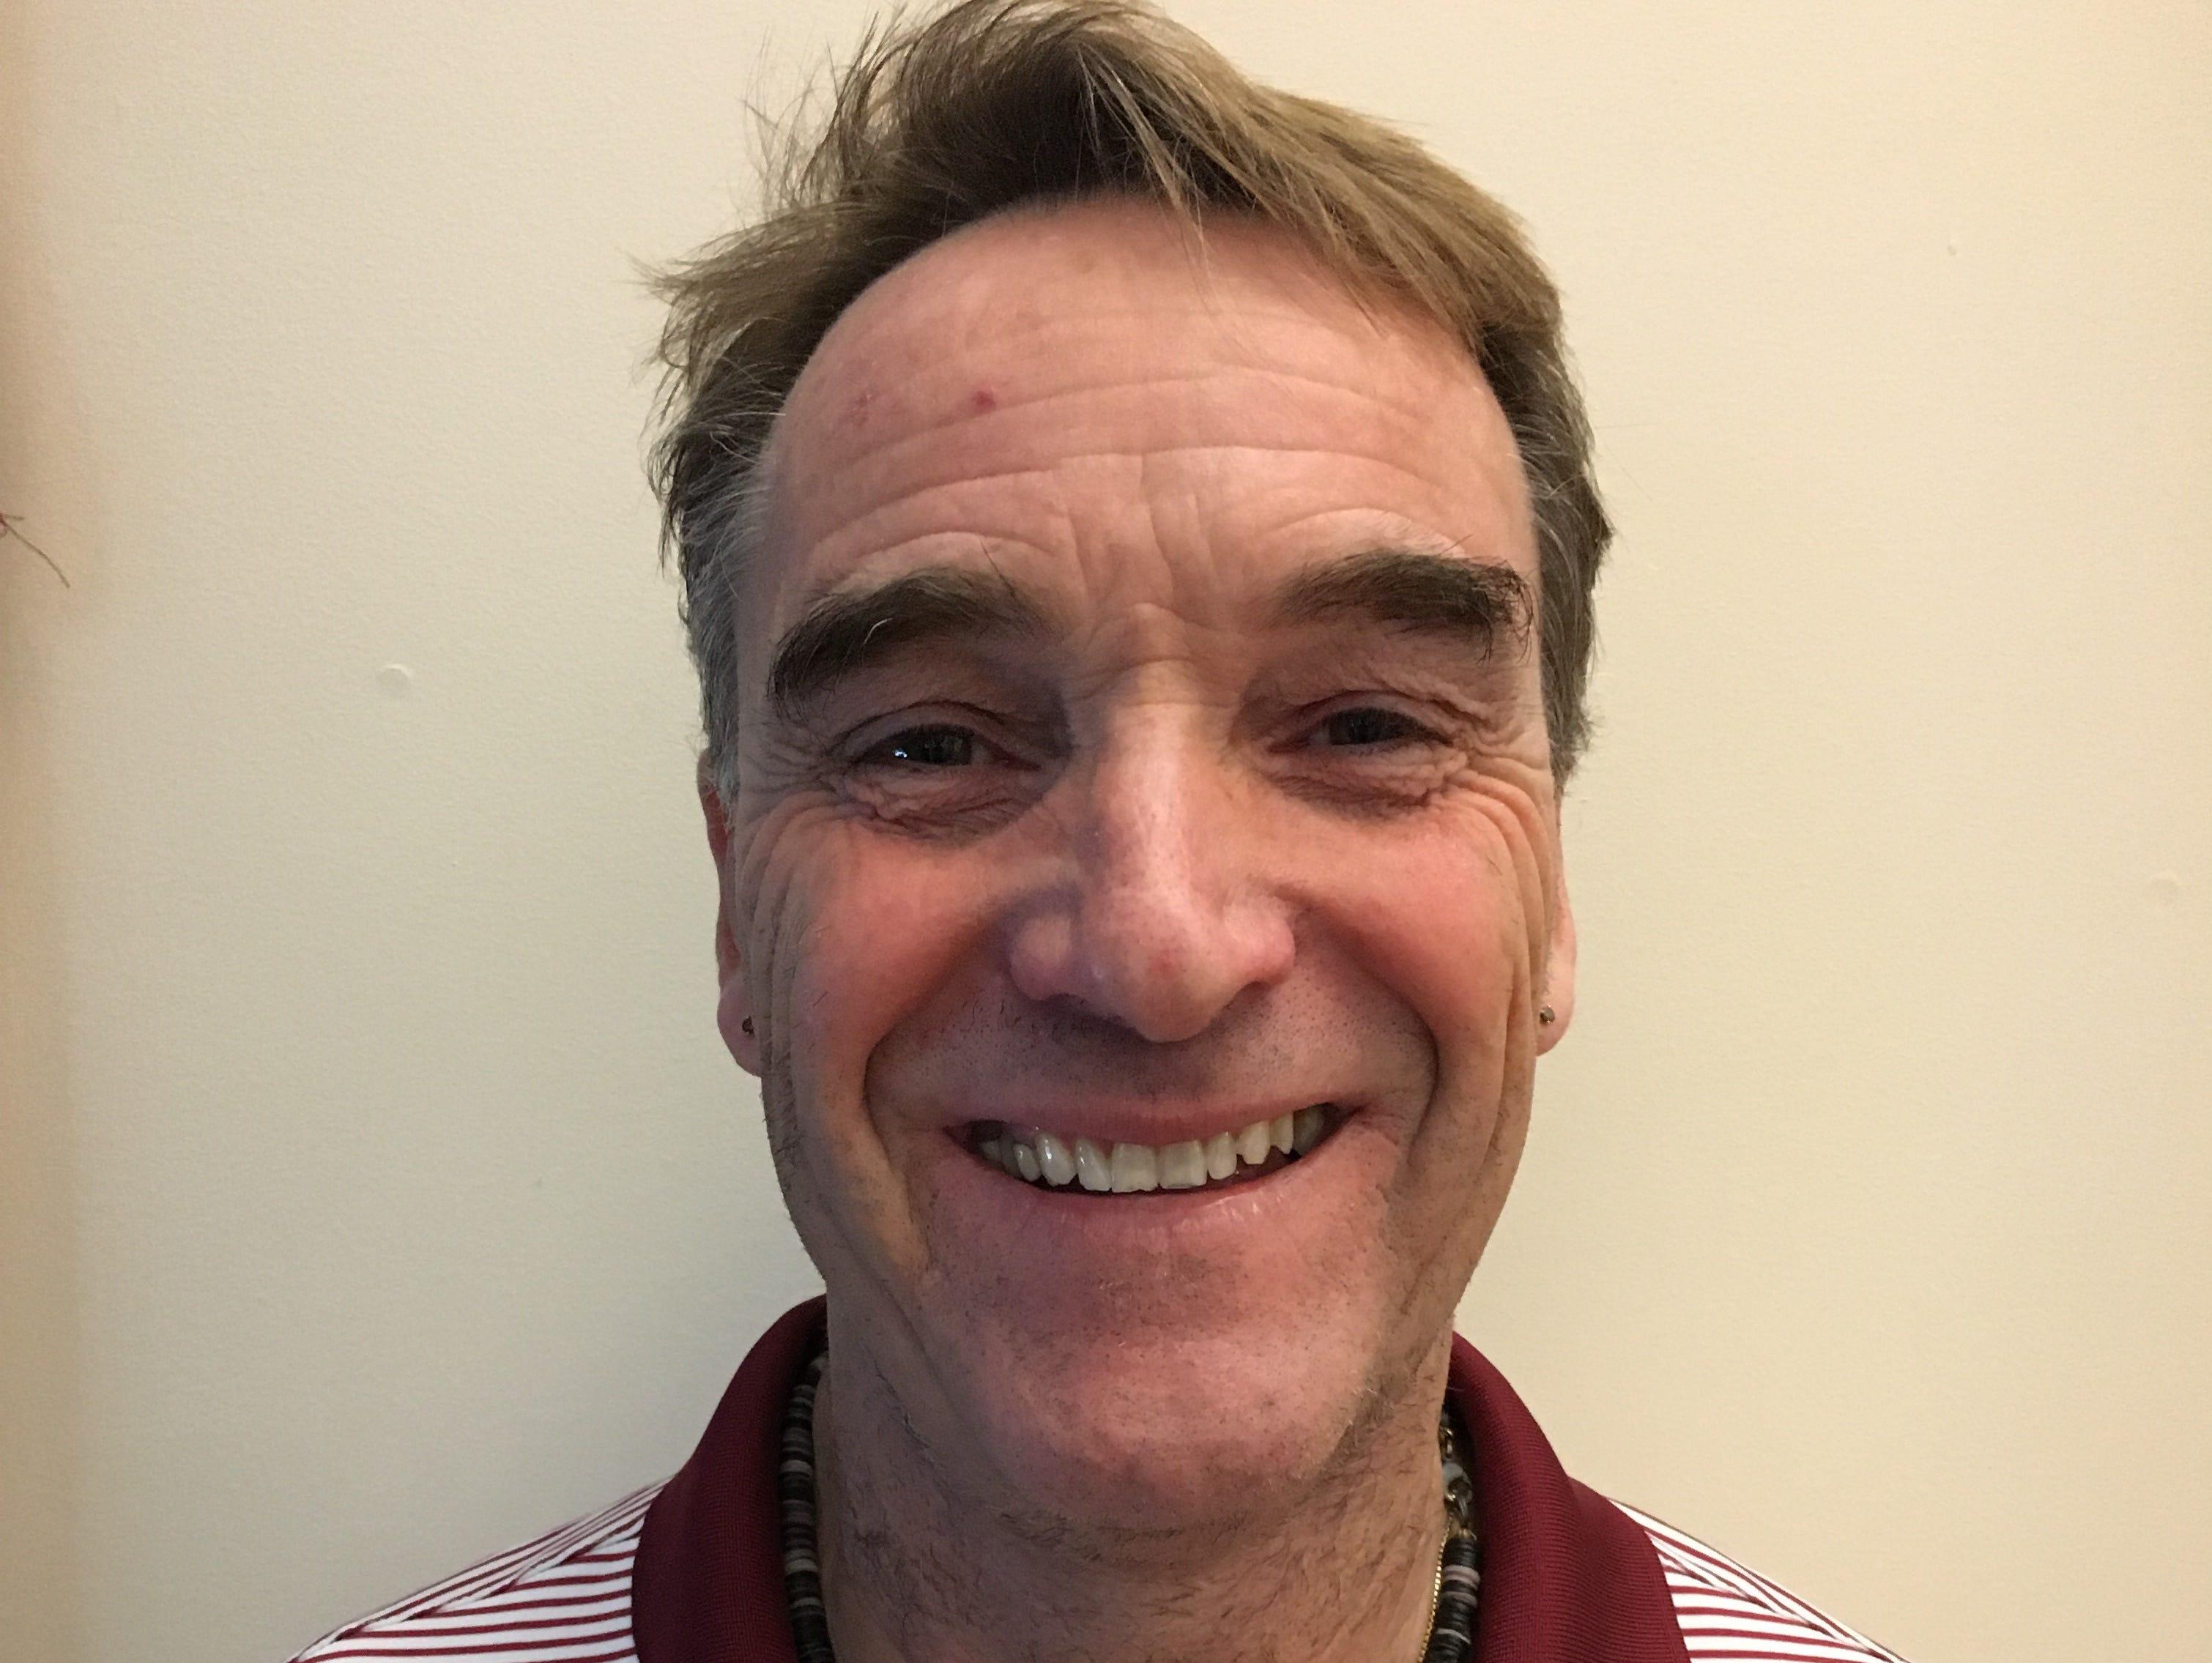 Kieran McIlvenny, Arlington soccer coach